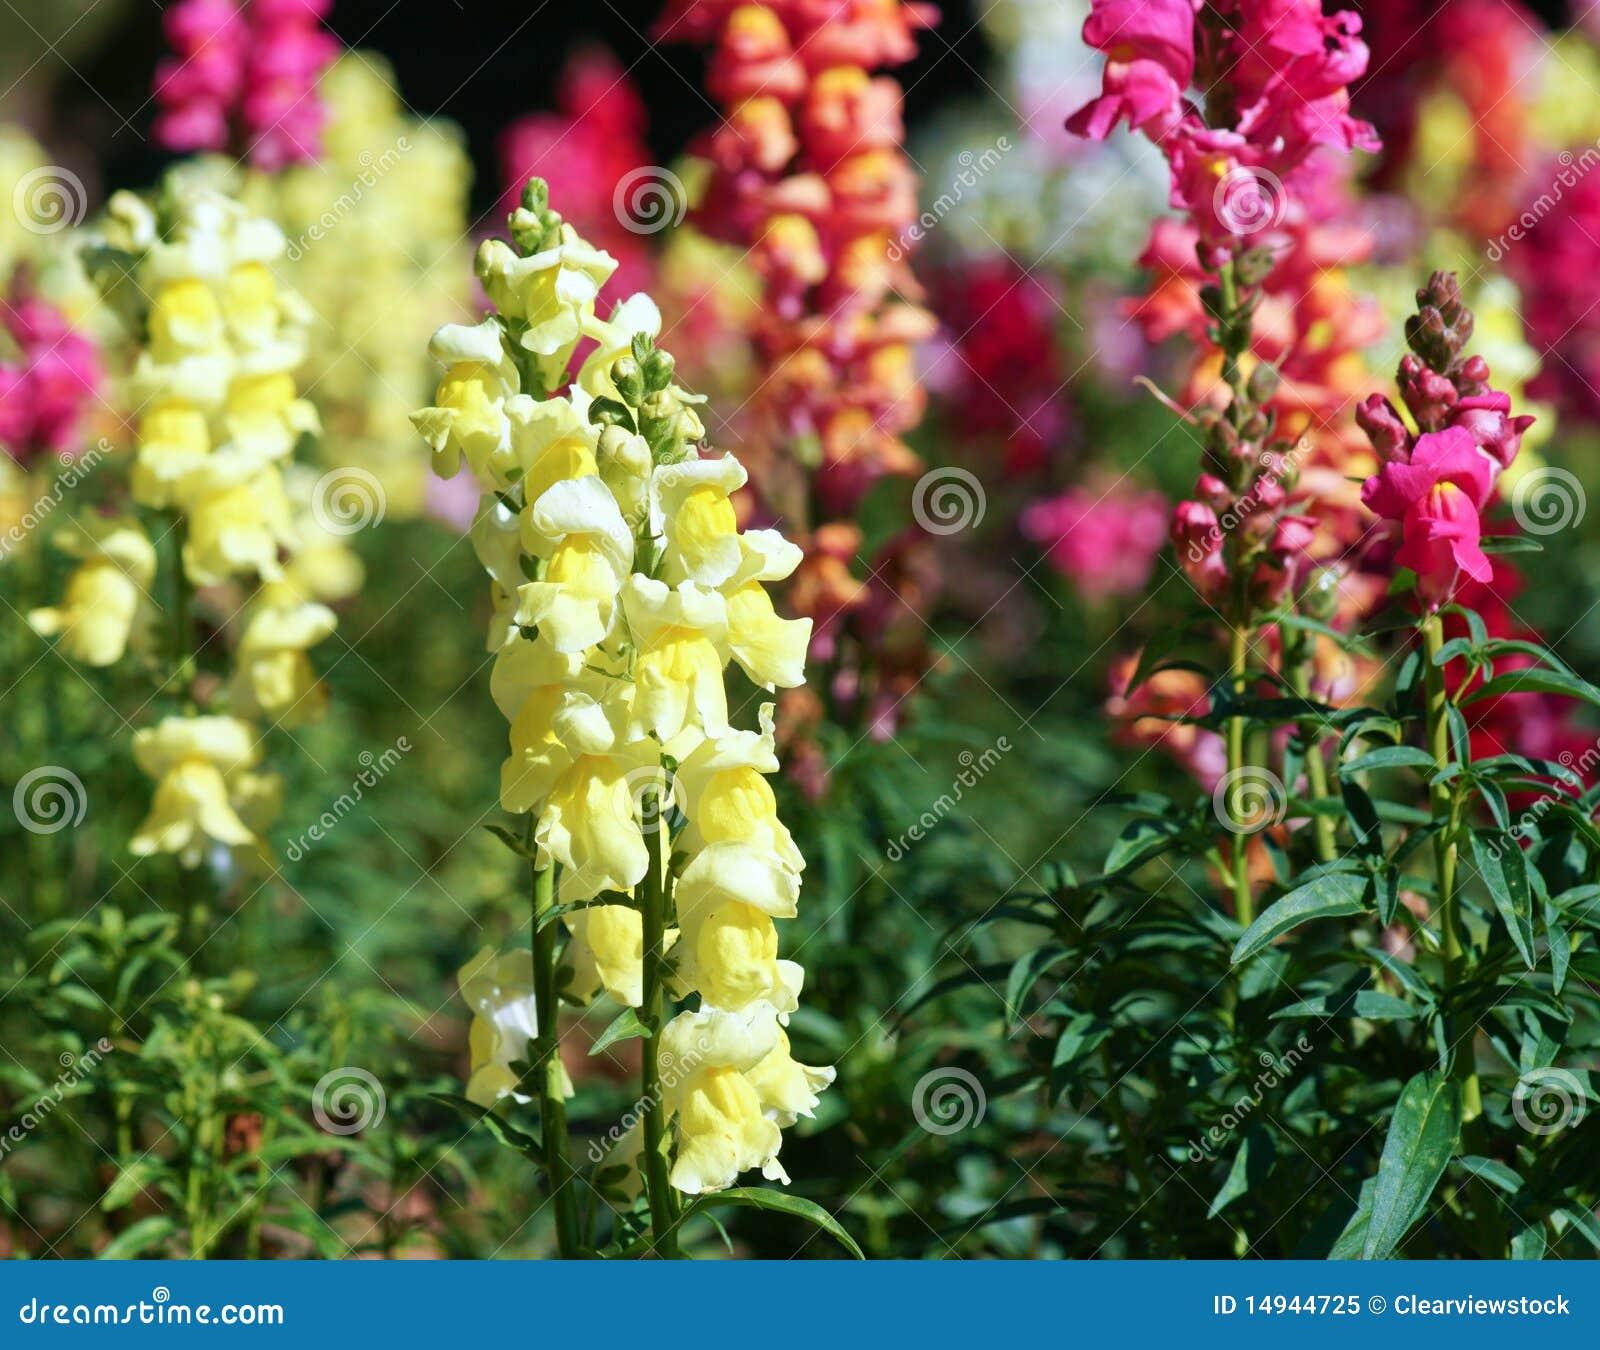 Beautiful Snapdragon Flowers Stock Image - Image: 14944725